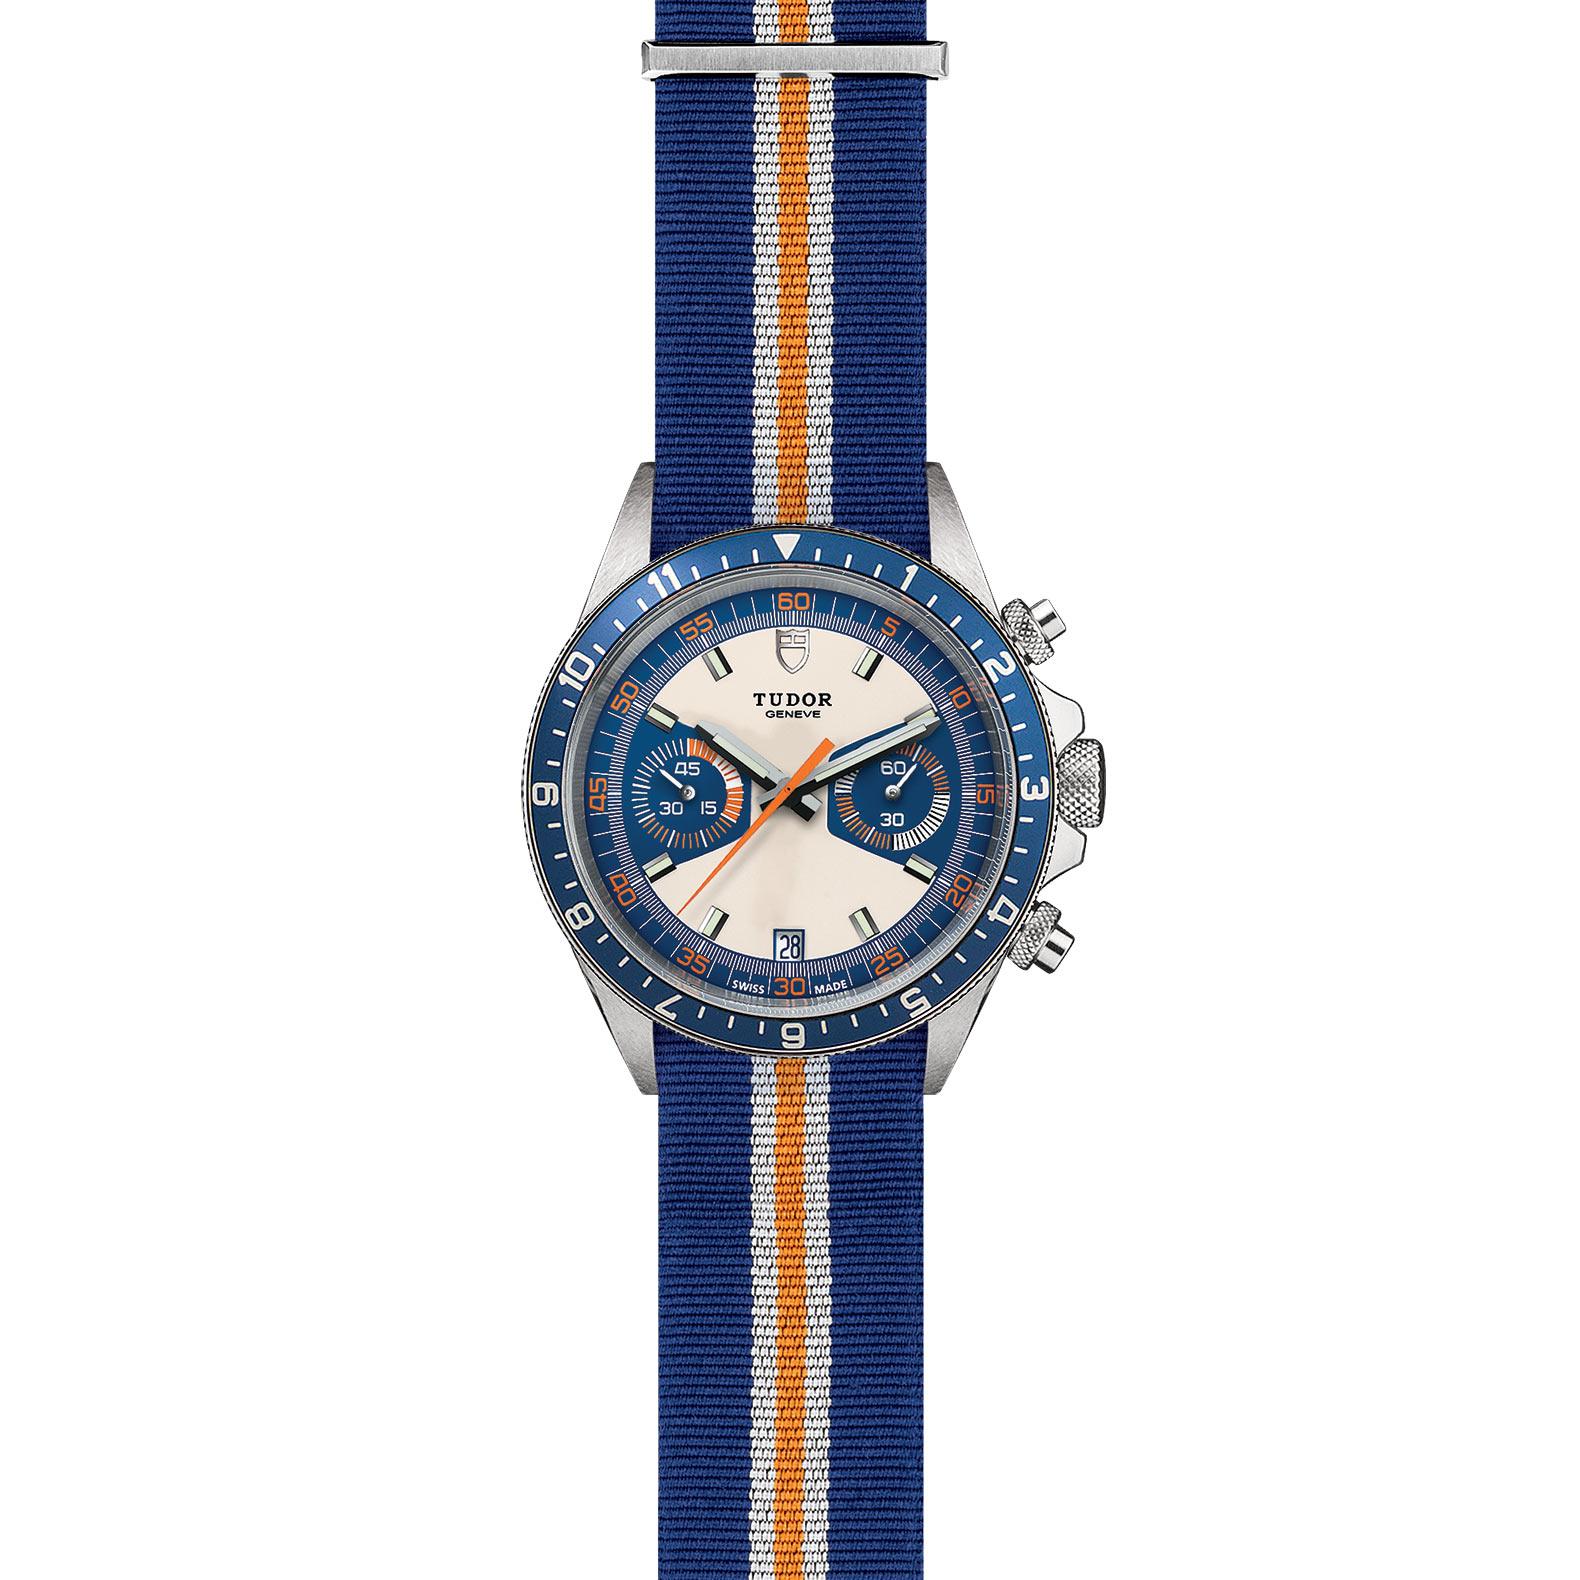 TUDOR Heritage Chrono Blue M70330B 0003 Frontfacing